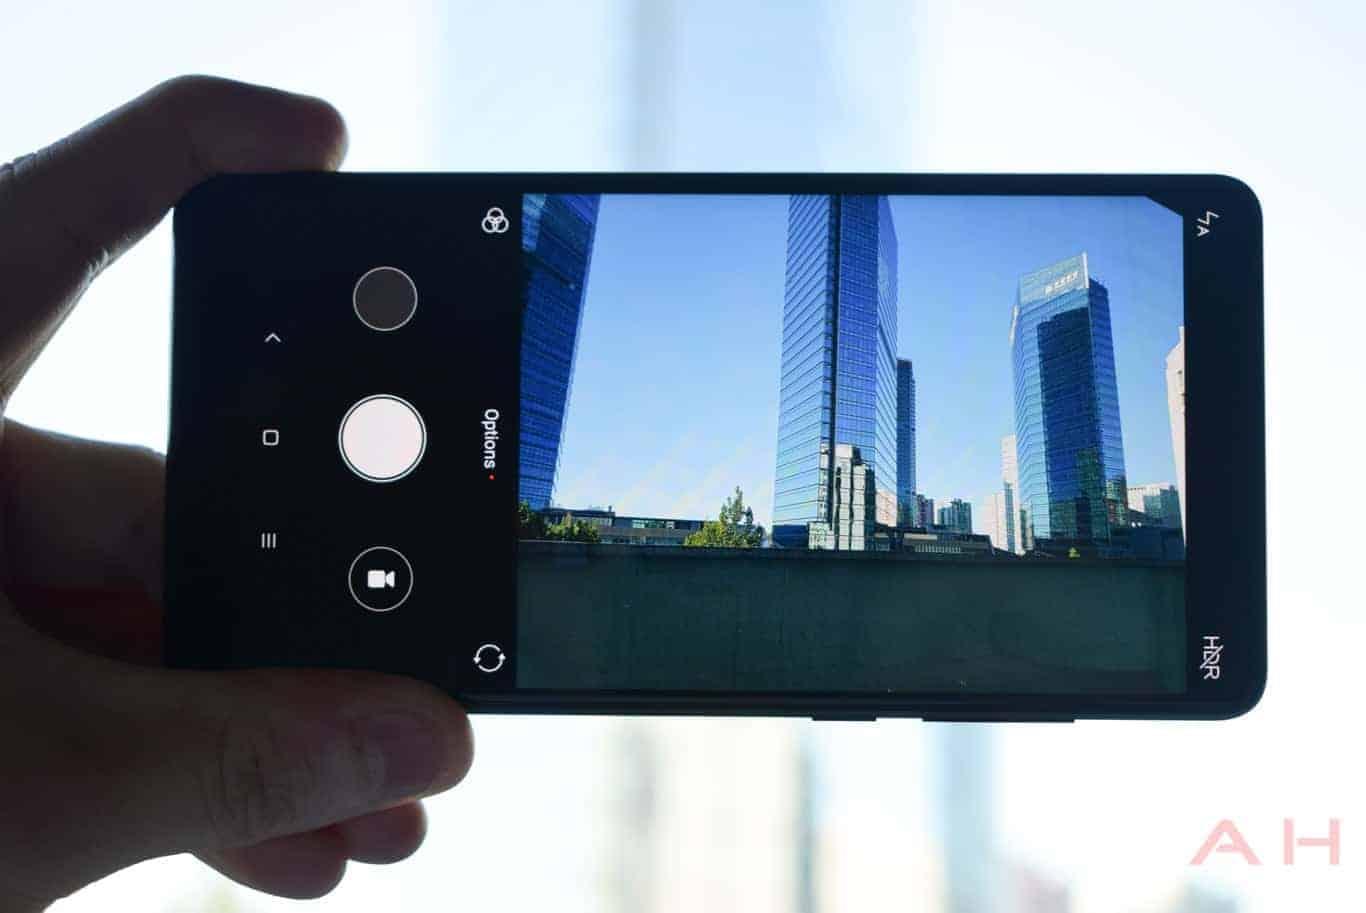 Xiaomi Mi MIX 2 Hands On AM AH 5